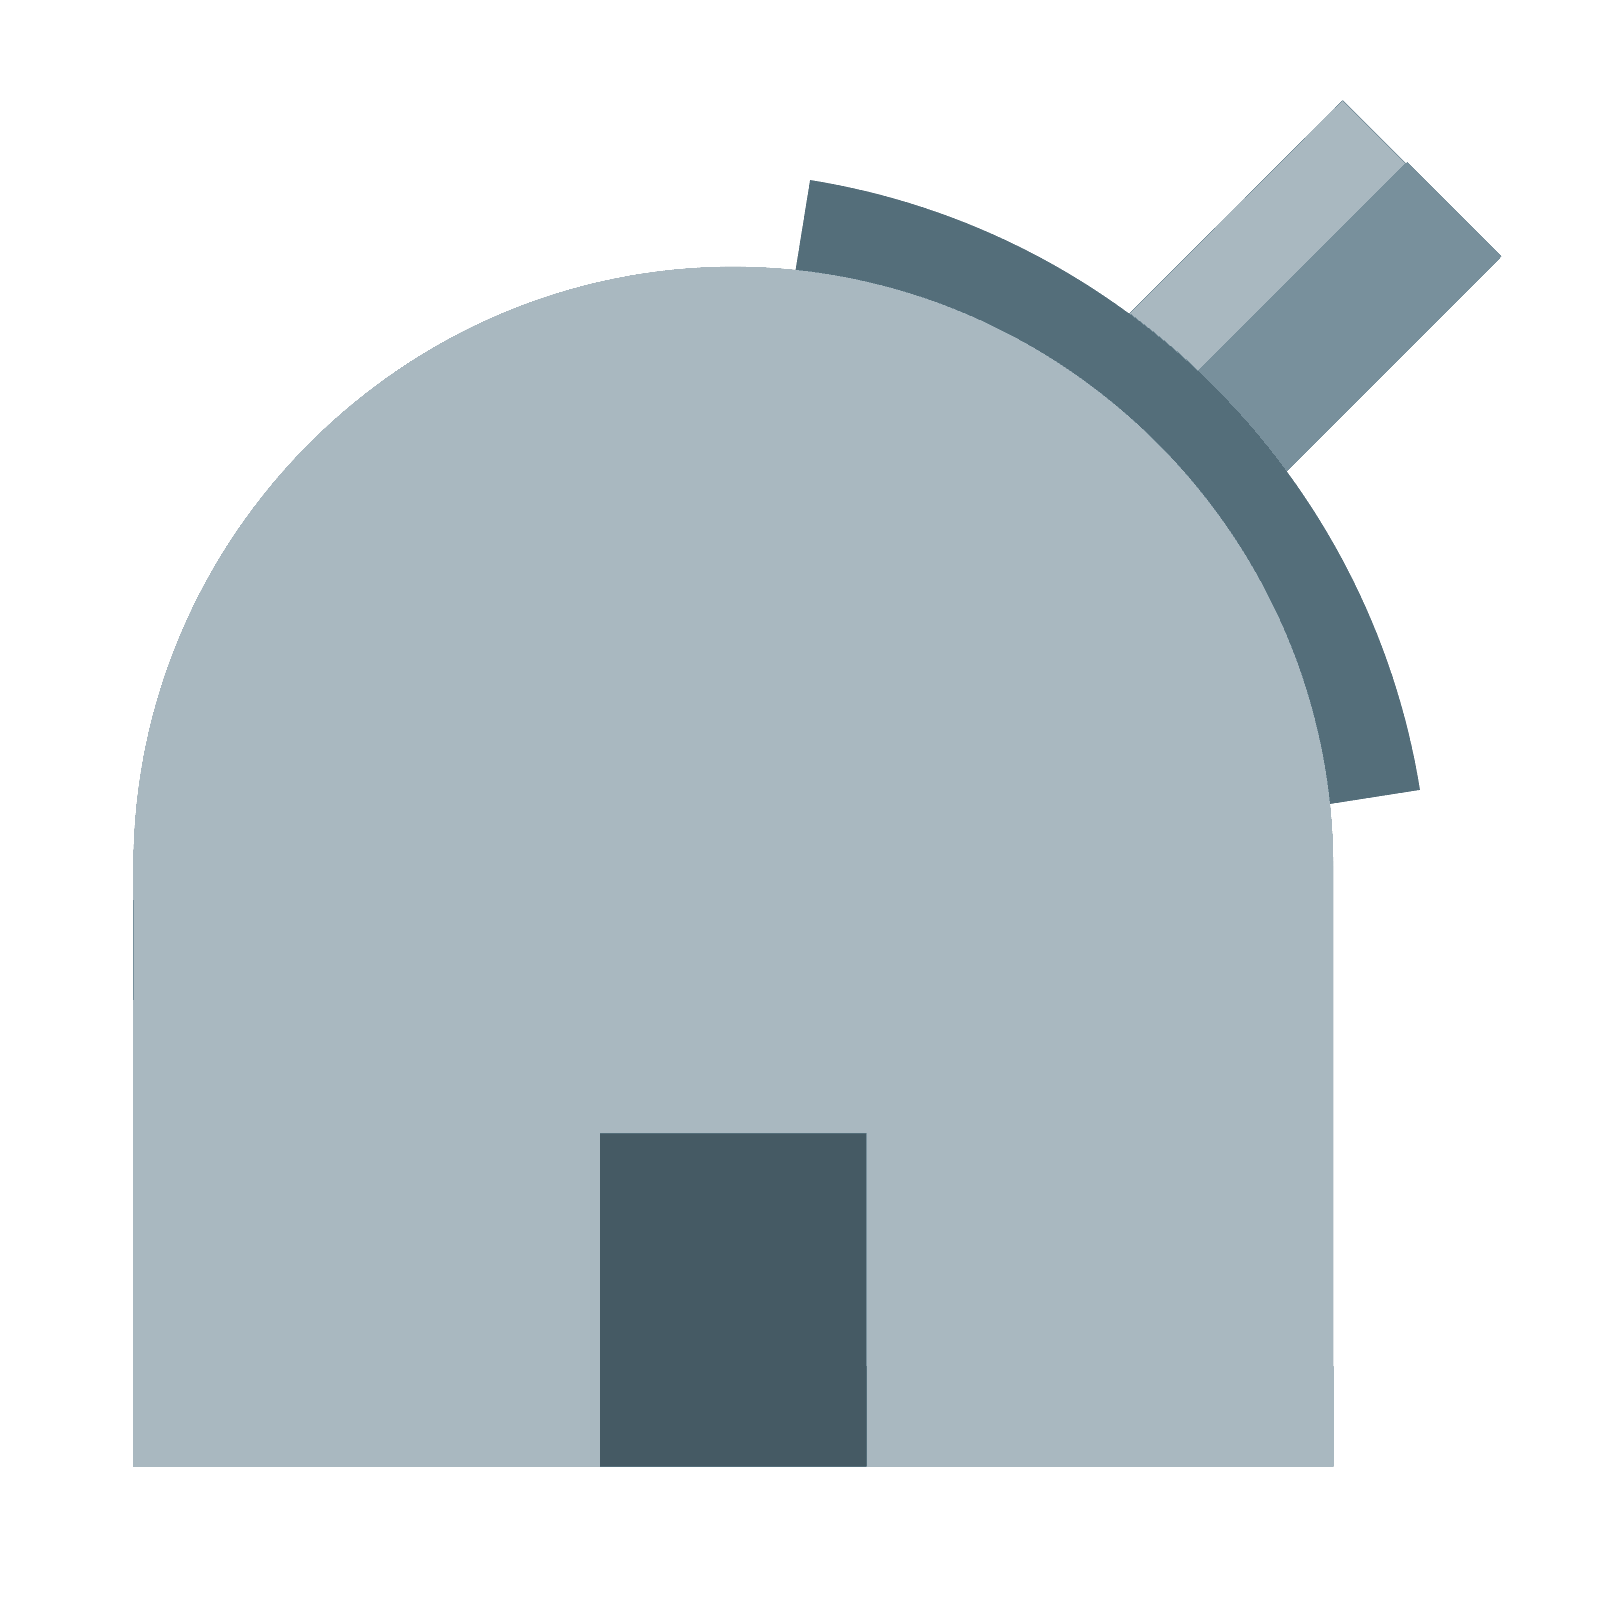 Galaxy clipart planetarium. Icon free download png